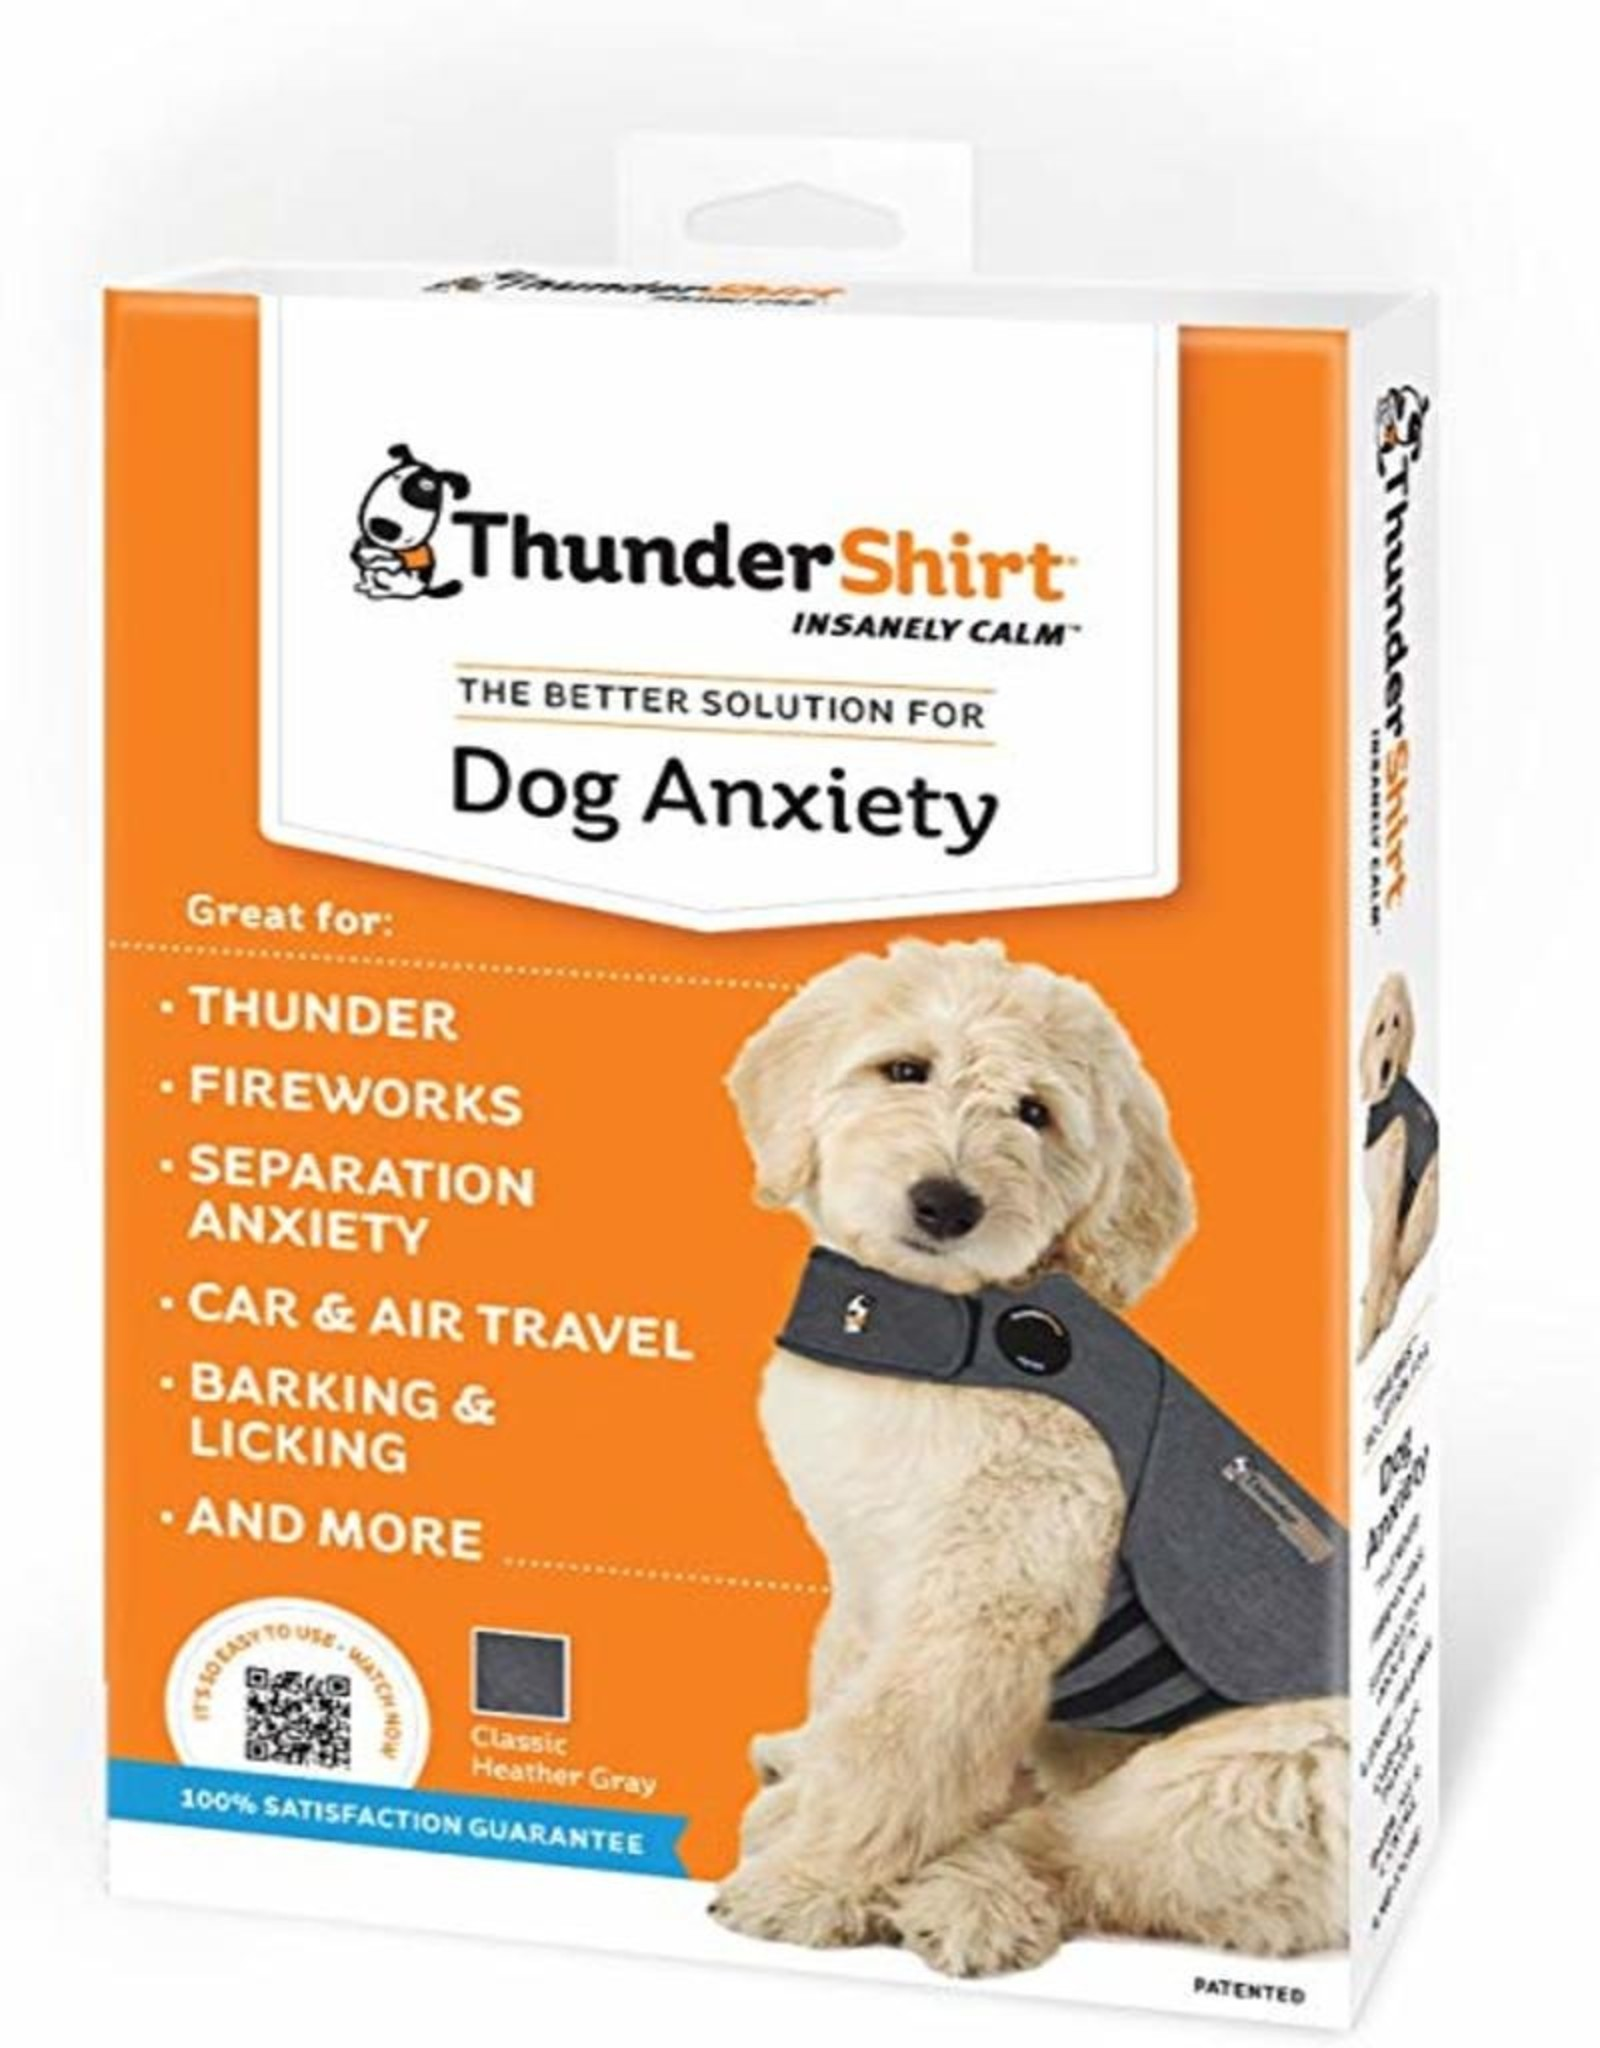 Thunder Shirt Sport Dog Anxiety Jacket